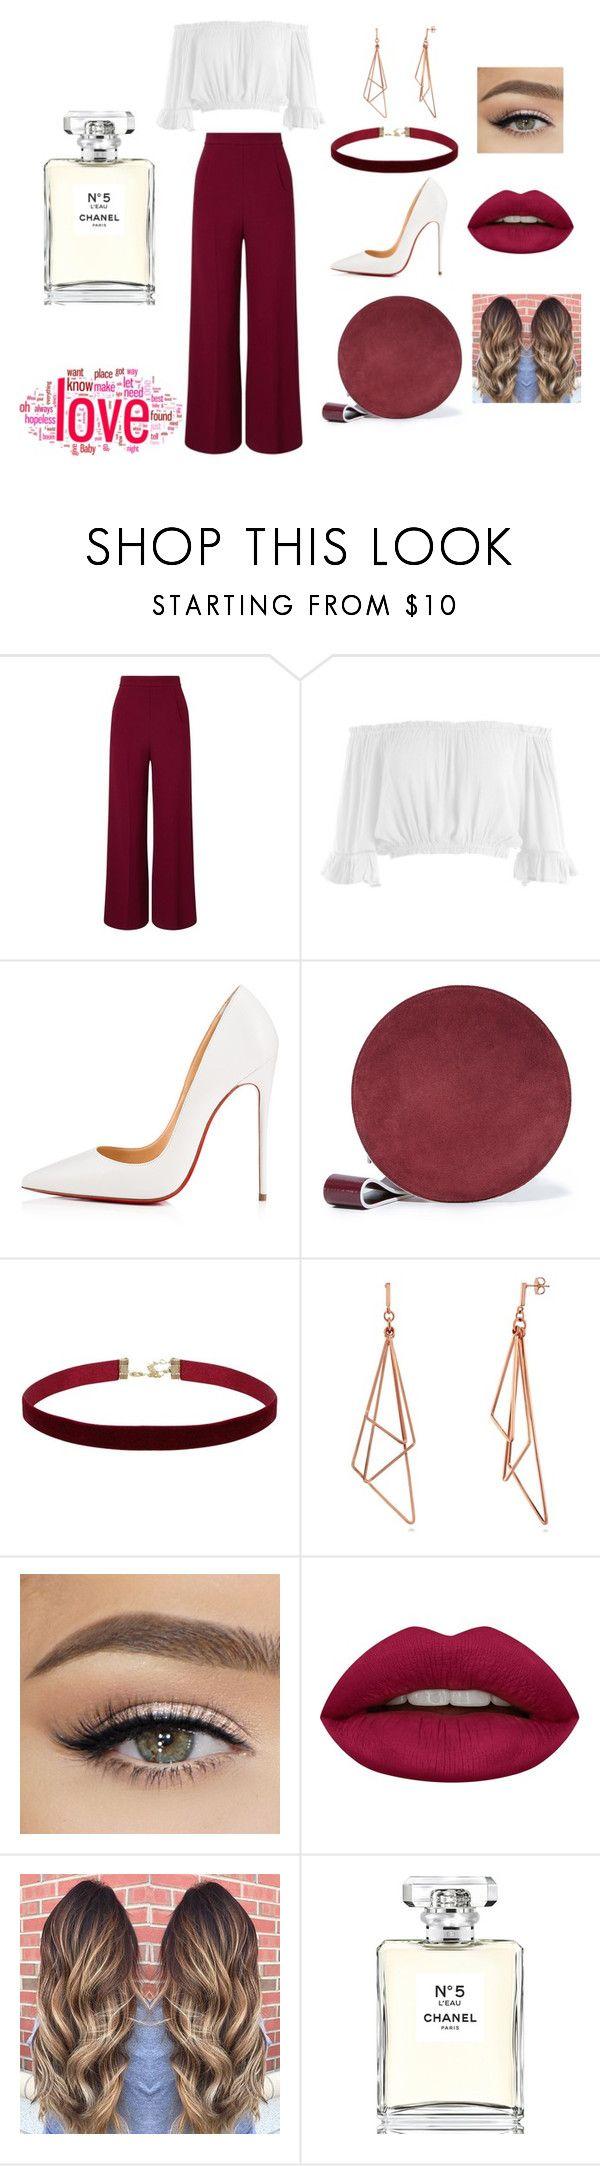 """White and Burgundy"" by zeynepkilic889 on Polyvore featuring moda, Roland Mouret, Sans Souci, Christian Louboutin, Diane Von Furstenberg, Huda Beauty ve Chanel"